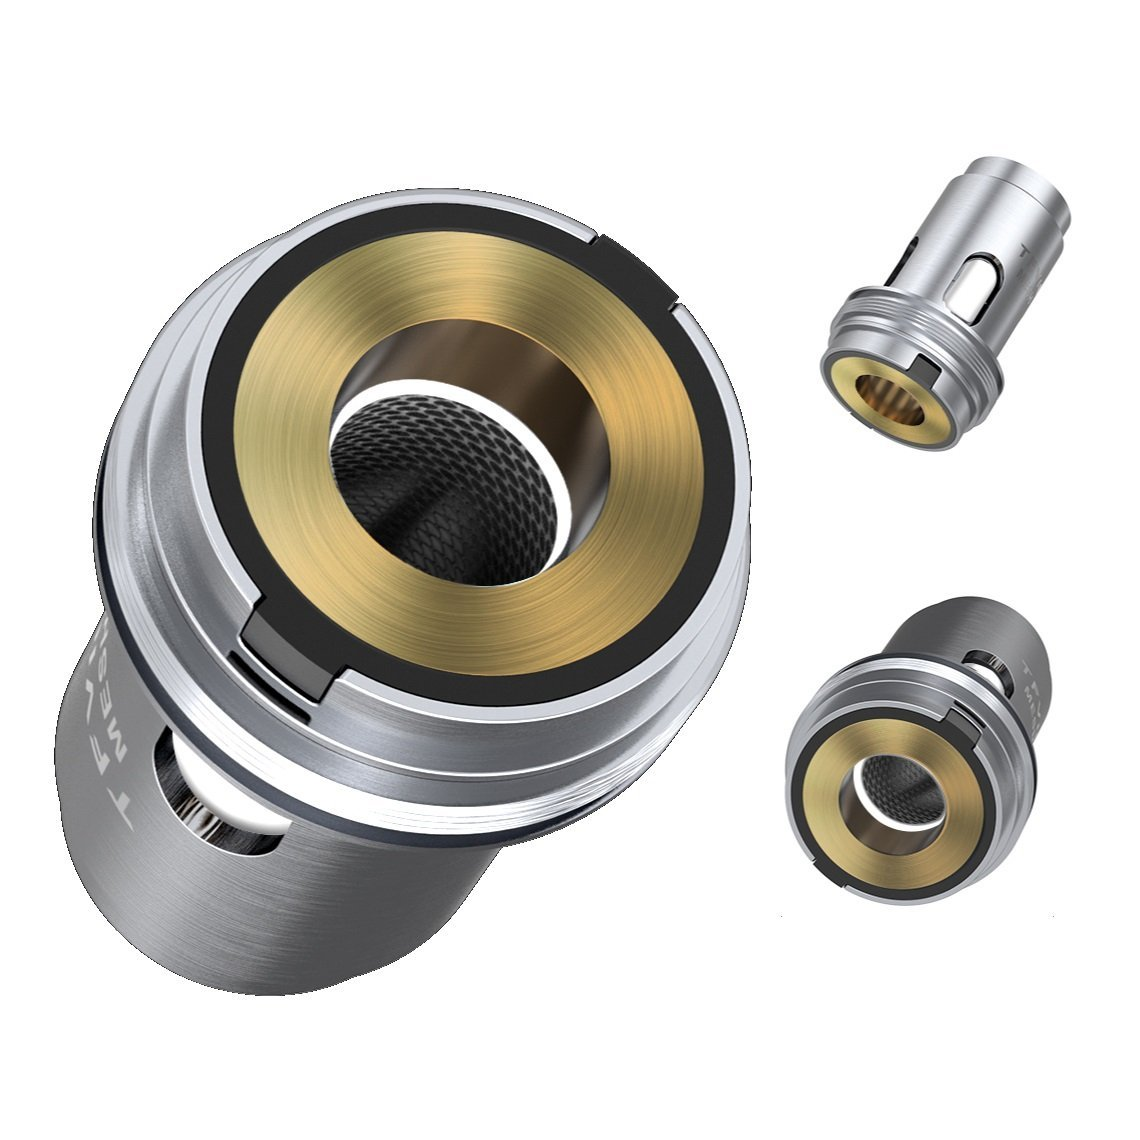 Smok TFV16 Single Mesh Coil - 0.17ohm